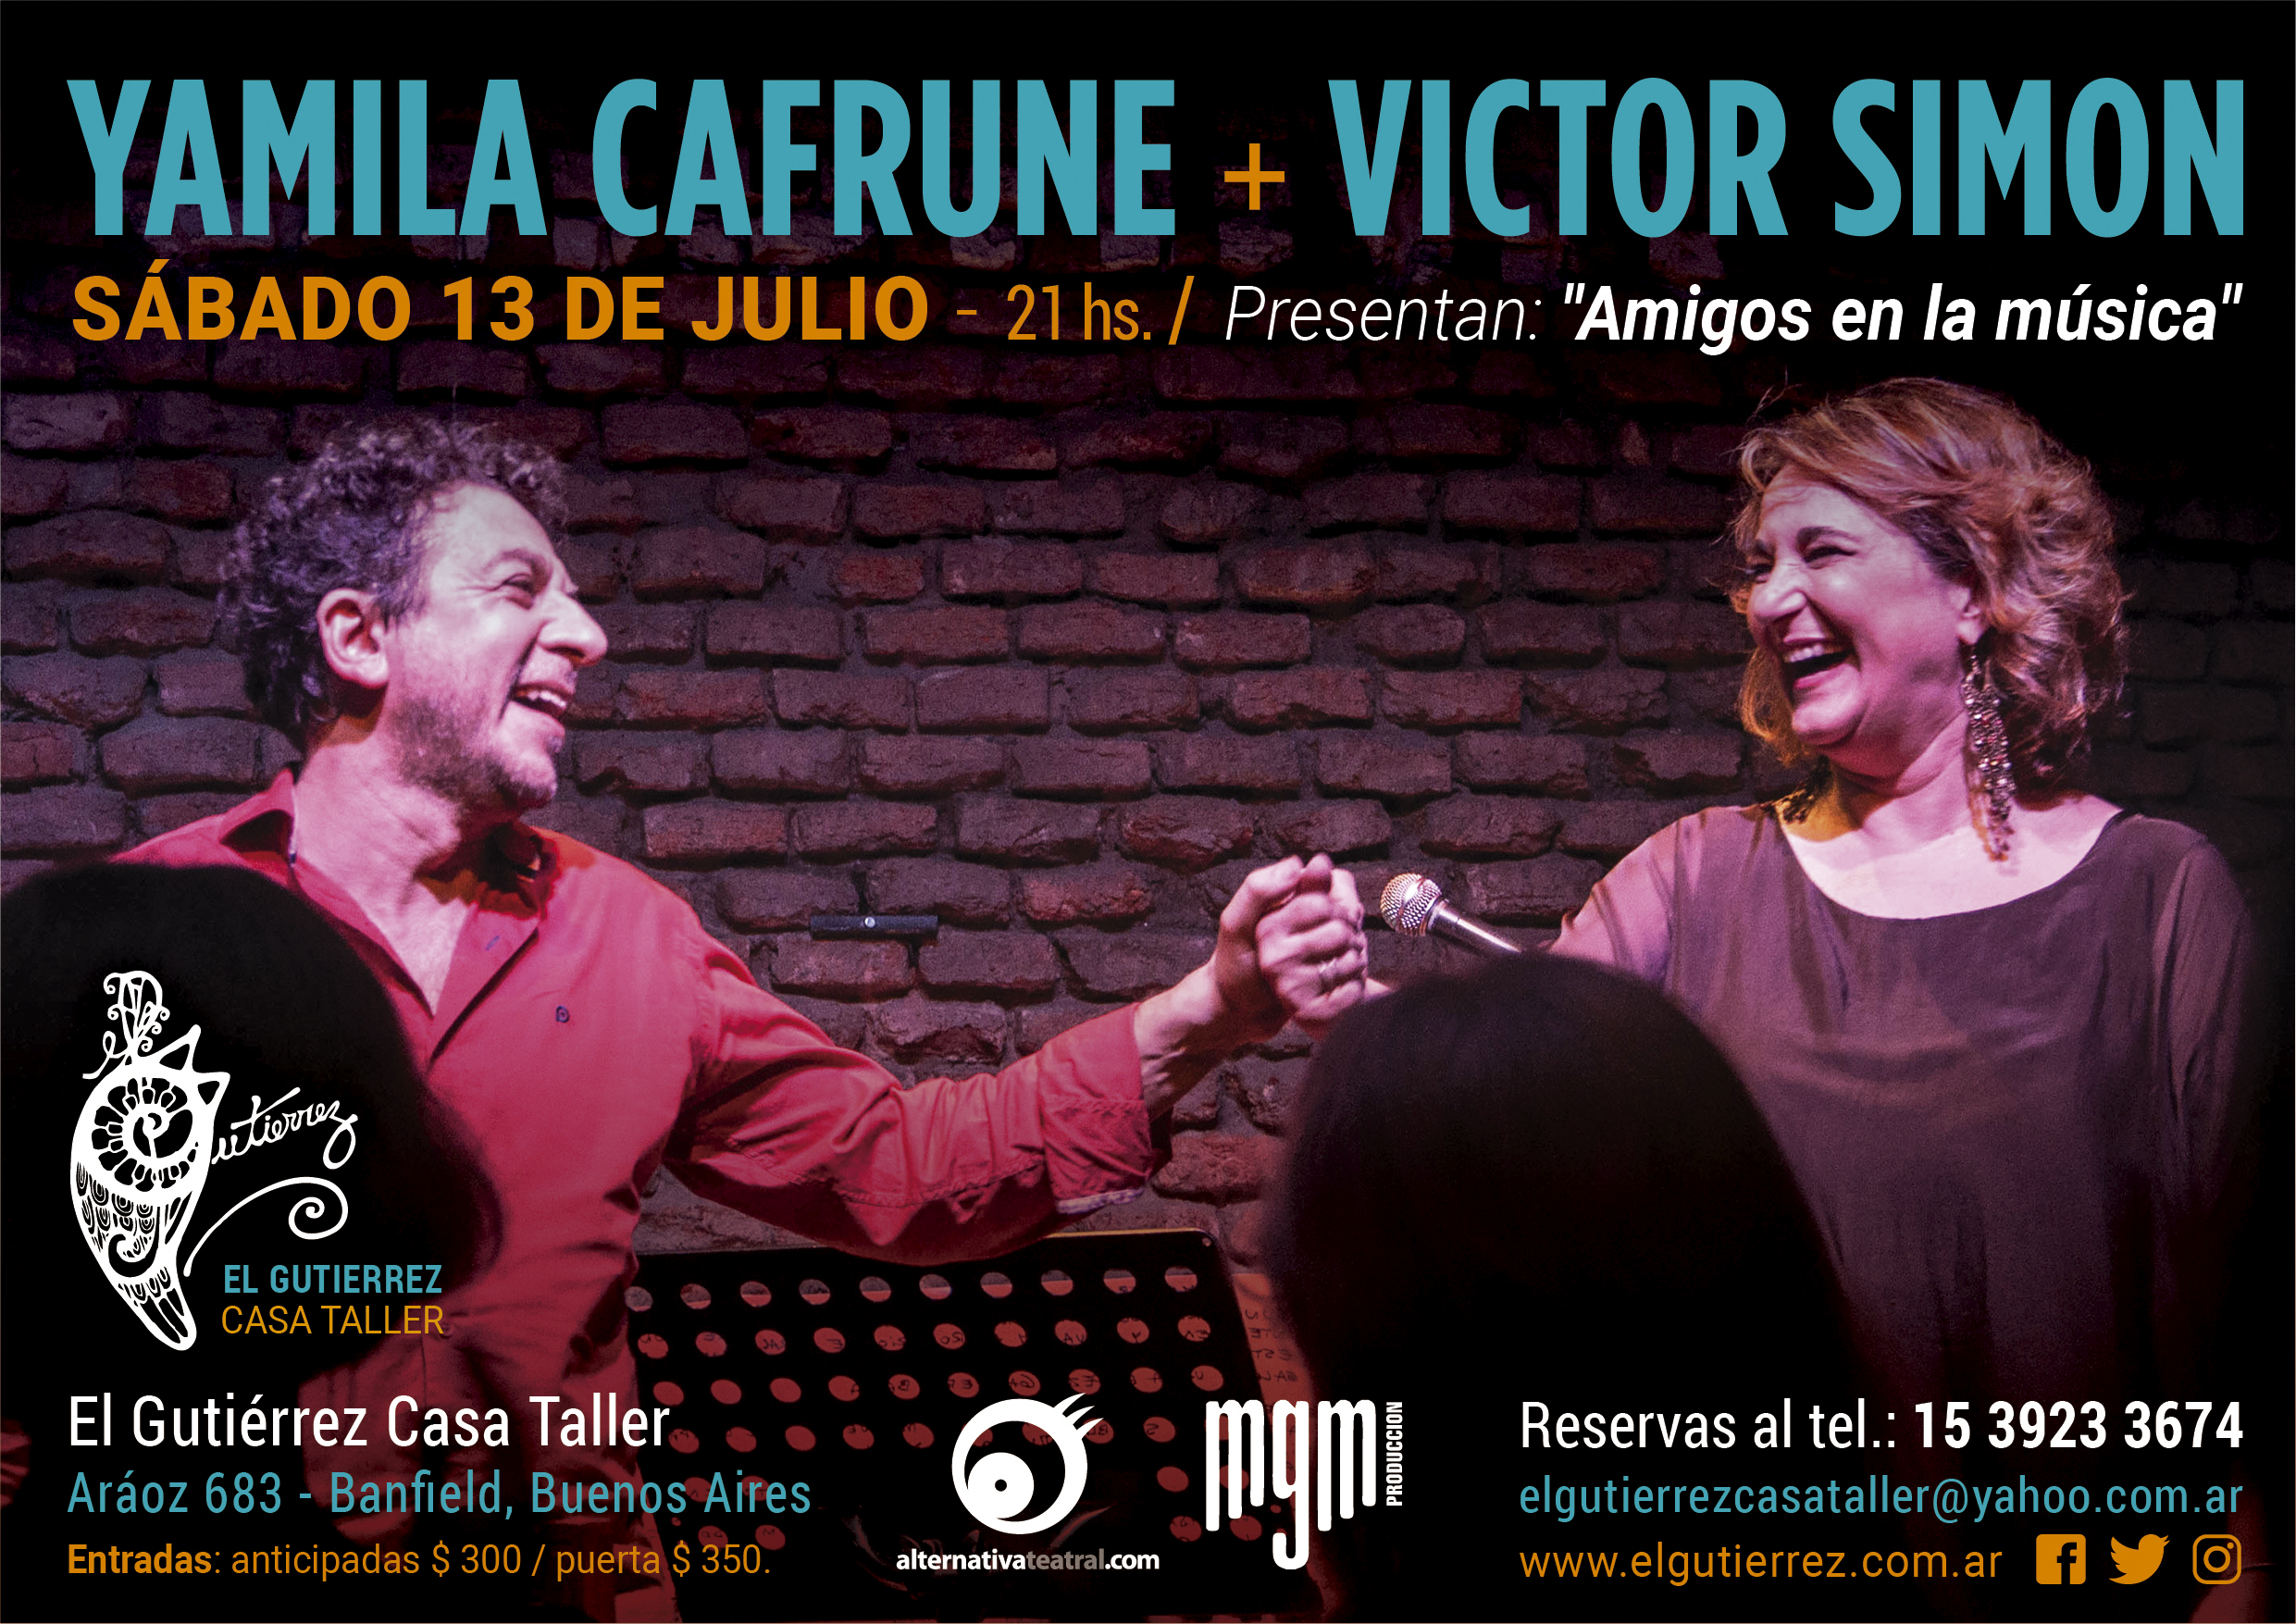 Yamila Cafrune y Victor Simon